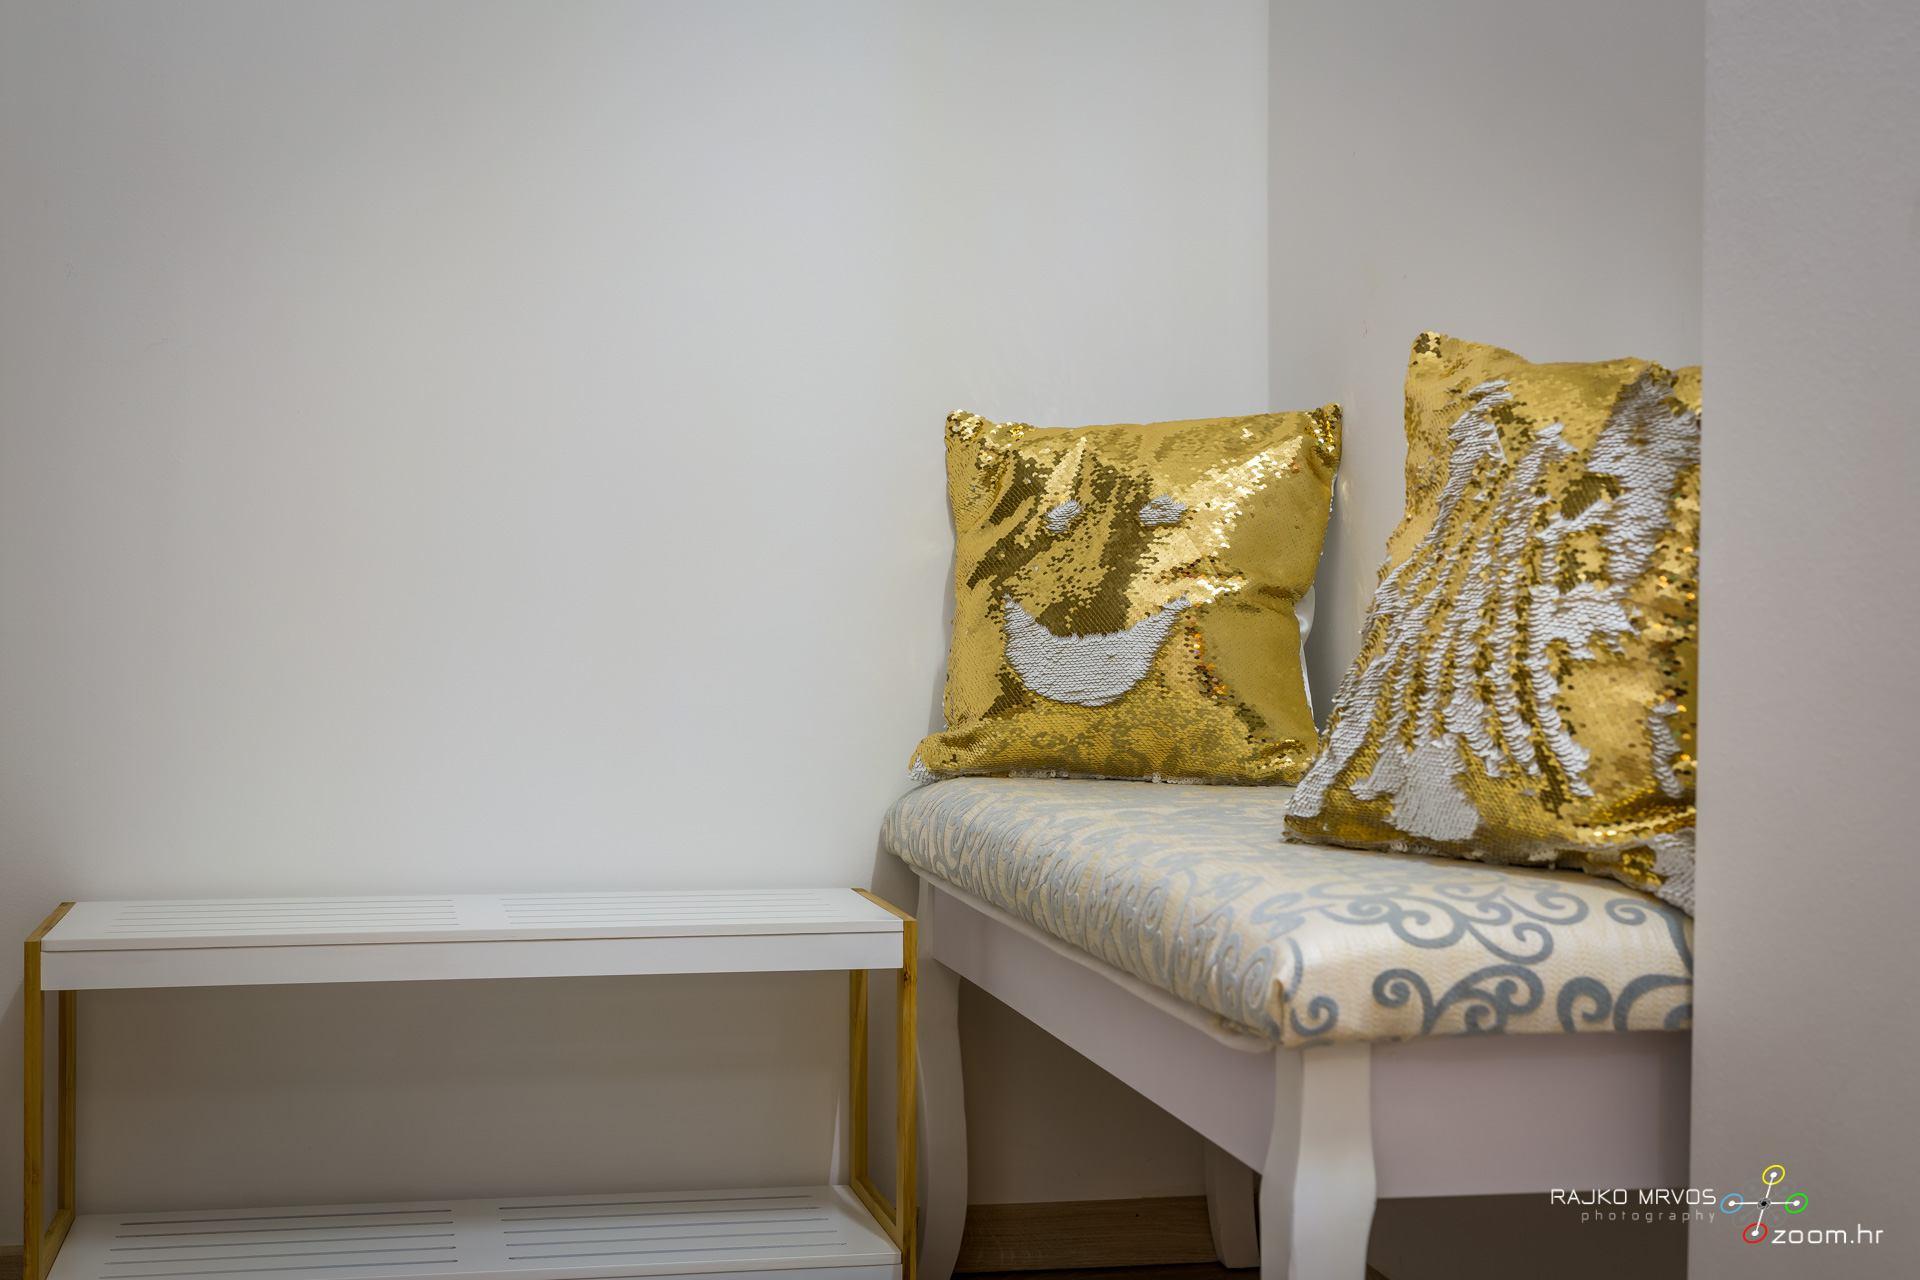 fotografiranje-interijera-fotograf-apartmana-vila-kuca-hotela-apartman-Gabby-Rijeka-43